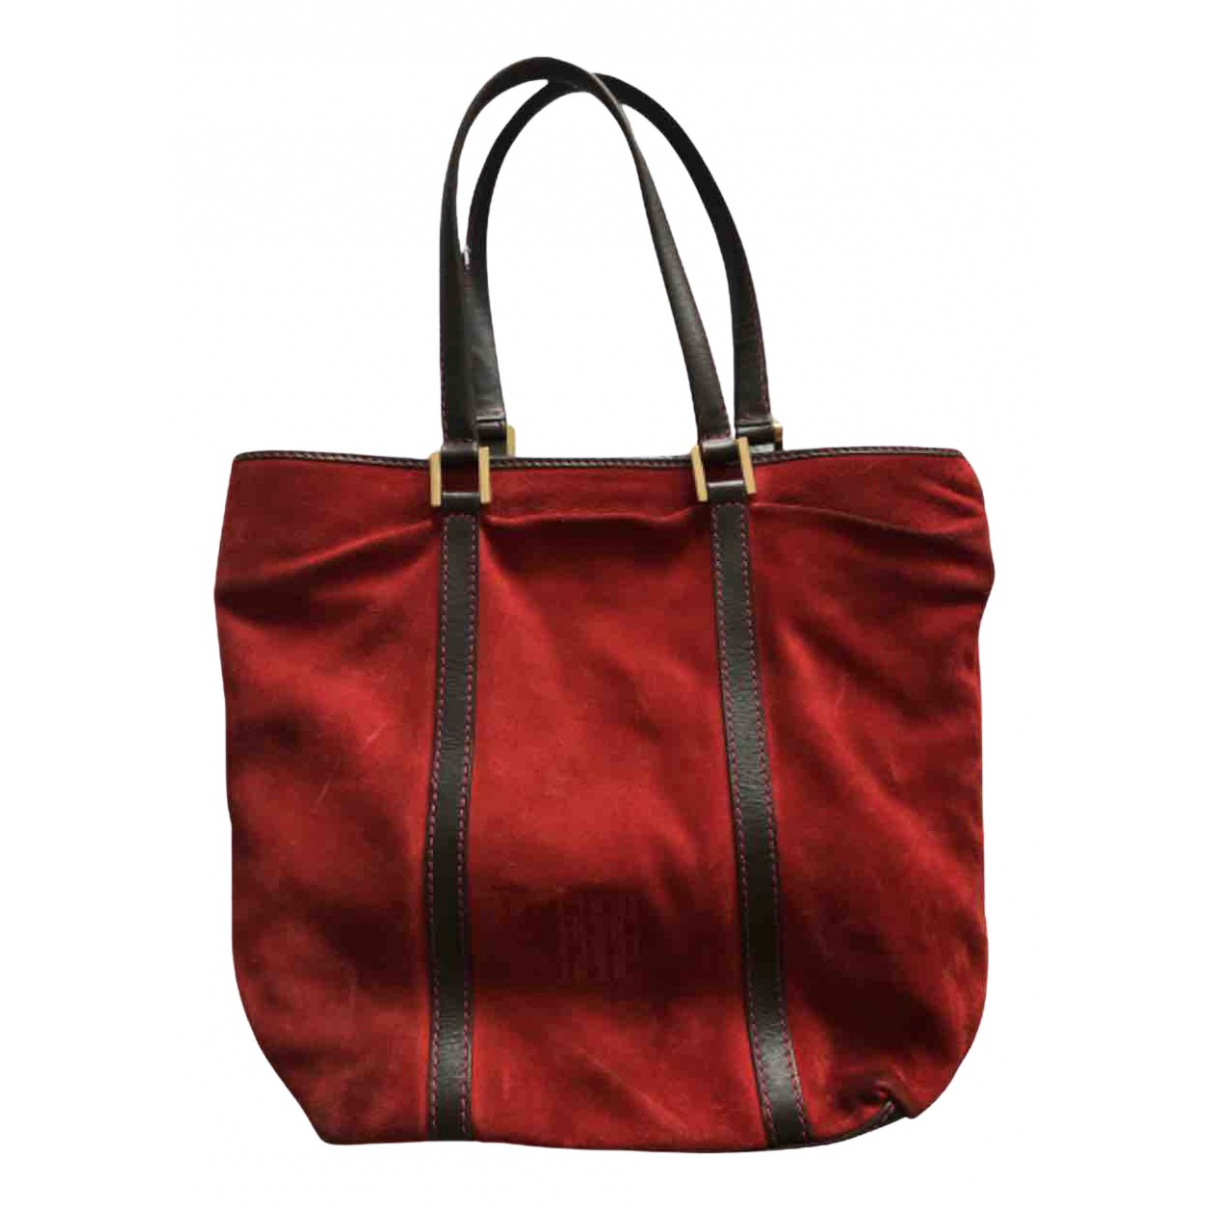 Moschino Cheap And Chic \N Handtasche in  Rot Veloursleder